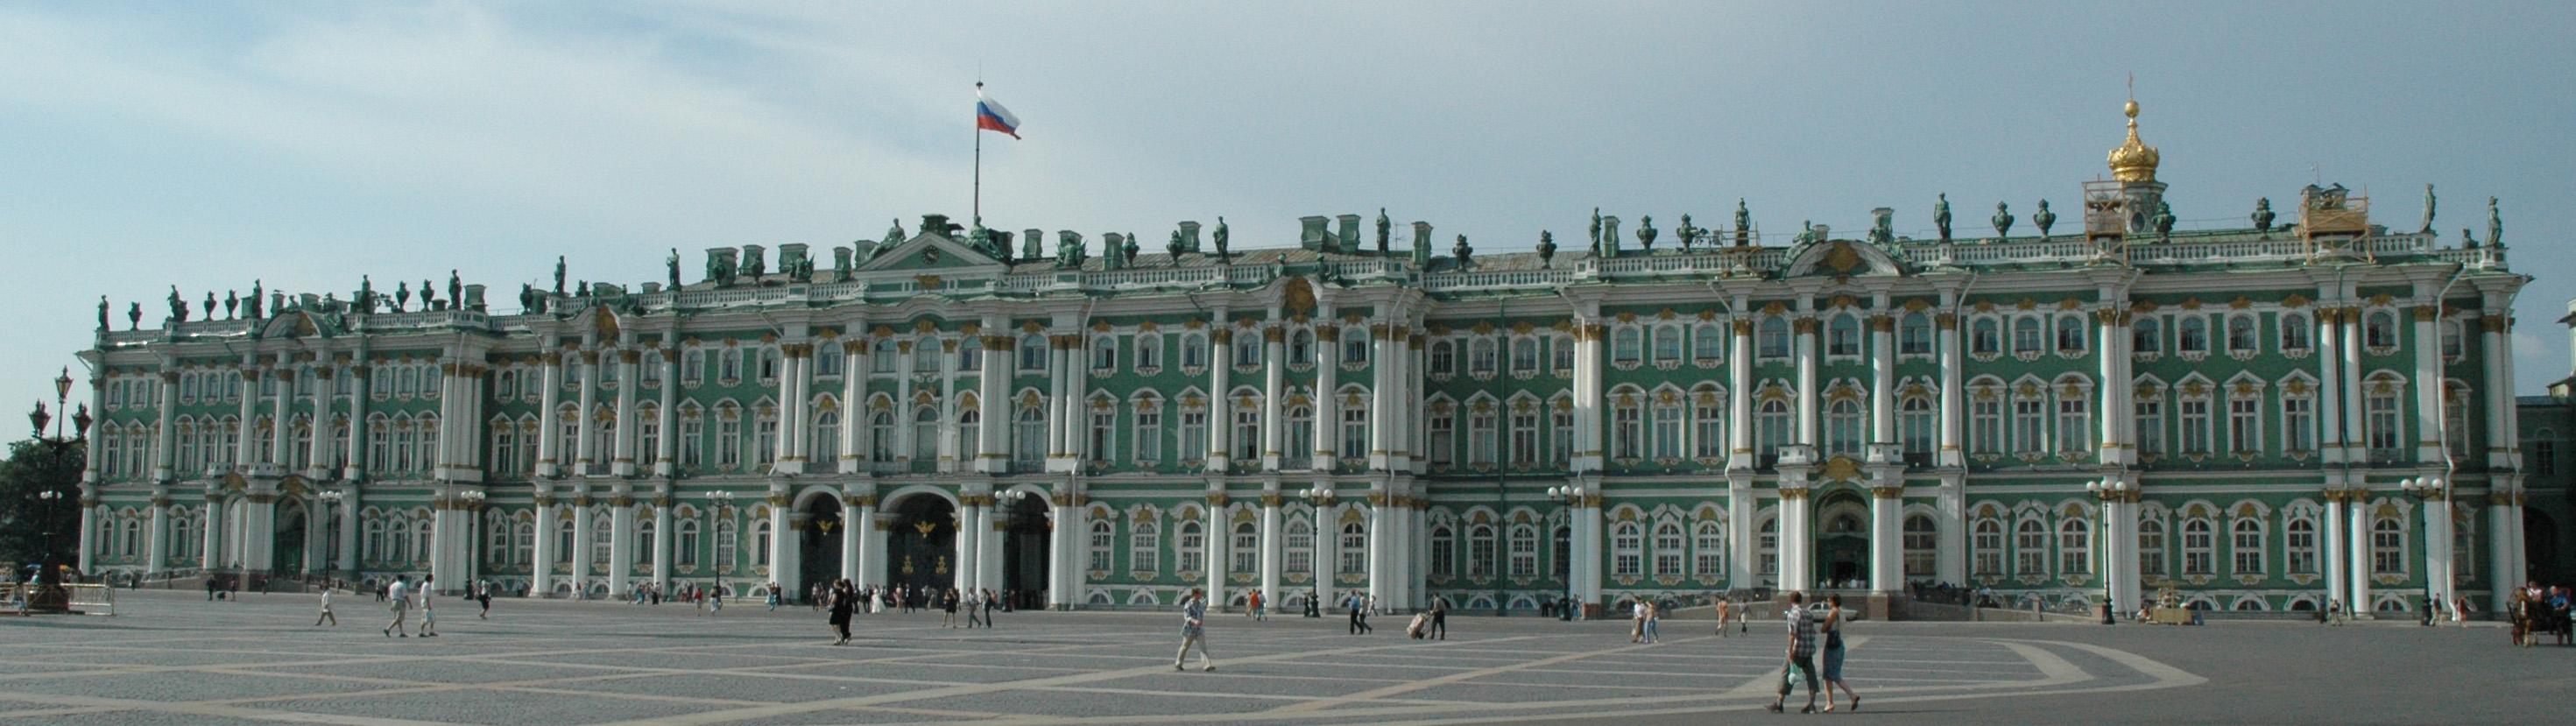 http://upload.wikimedia.org/wikipedia/commons/7/7e/Winter_Palace_Facade_II.jpg